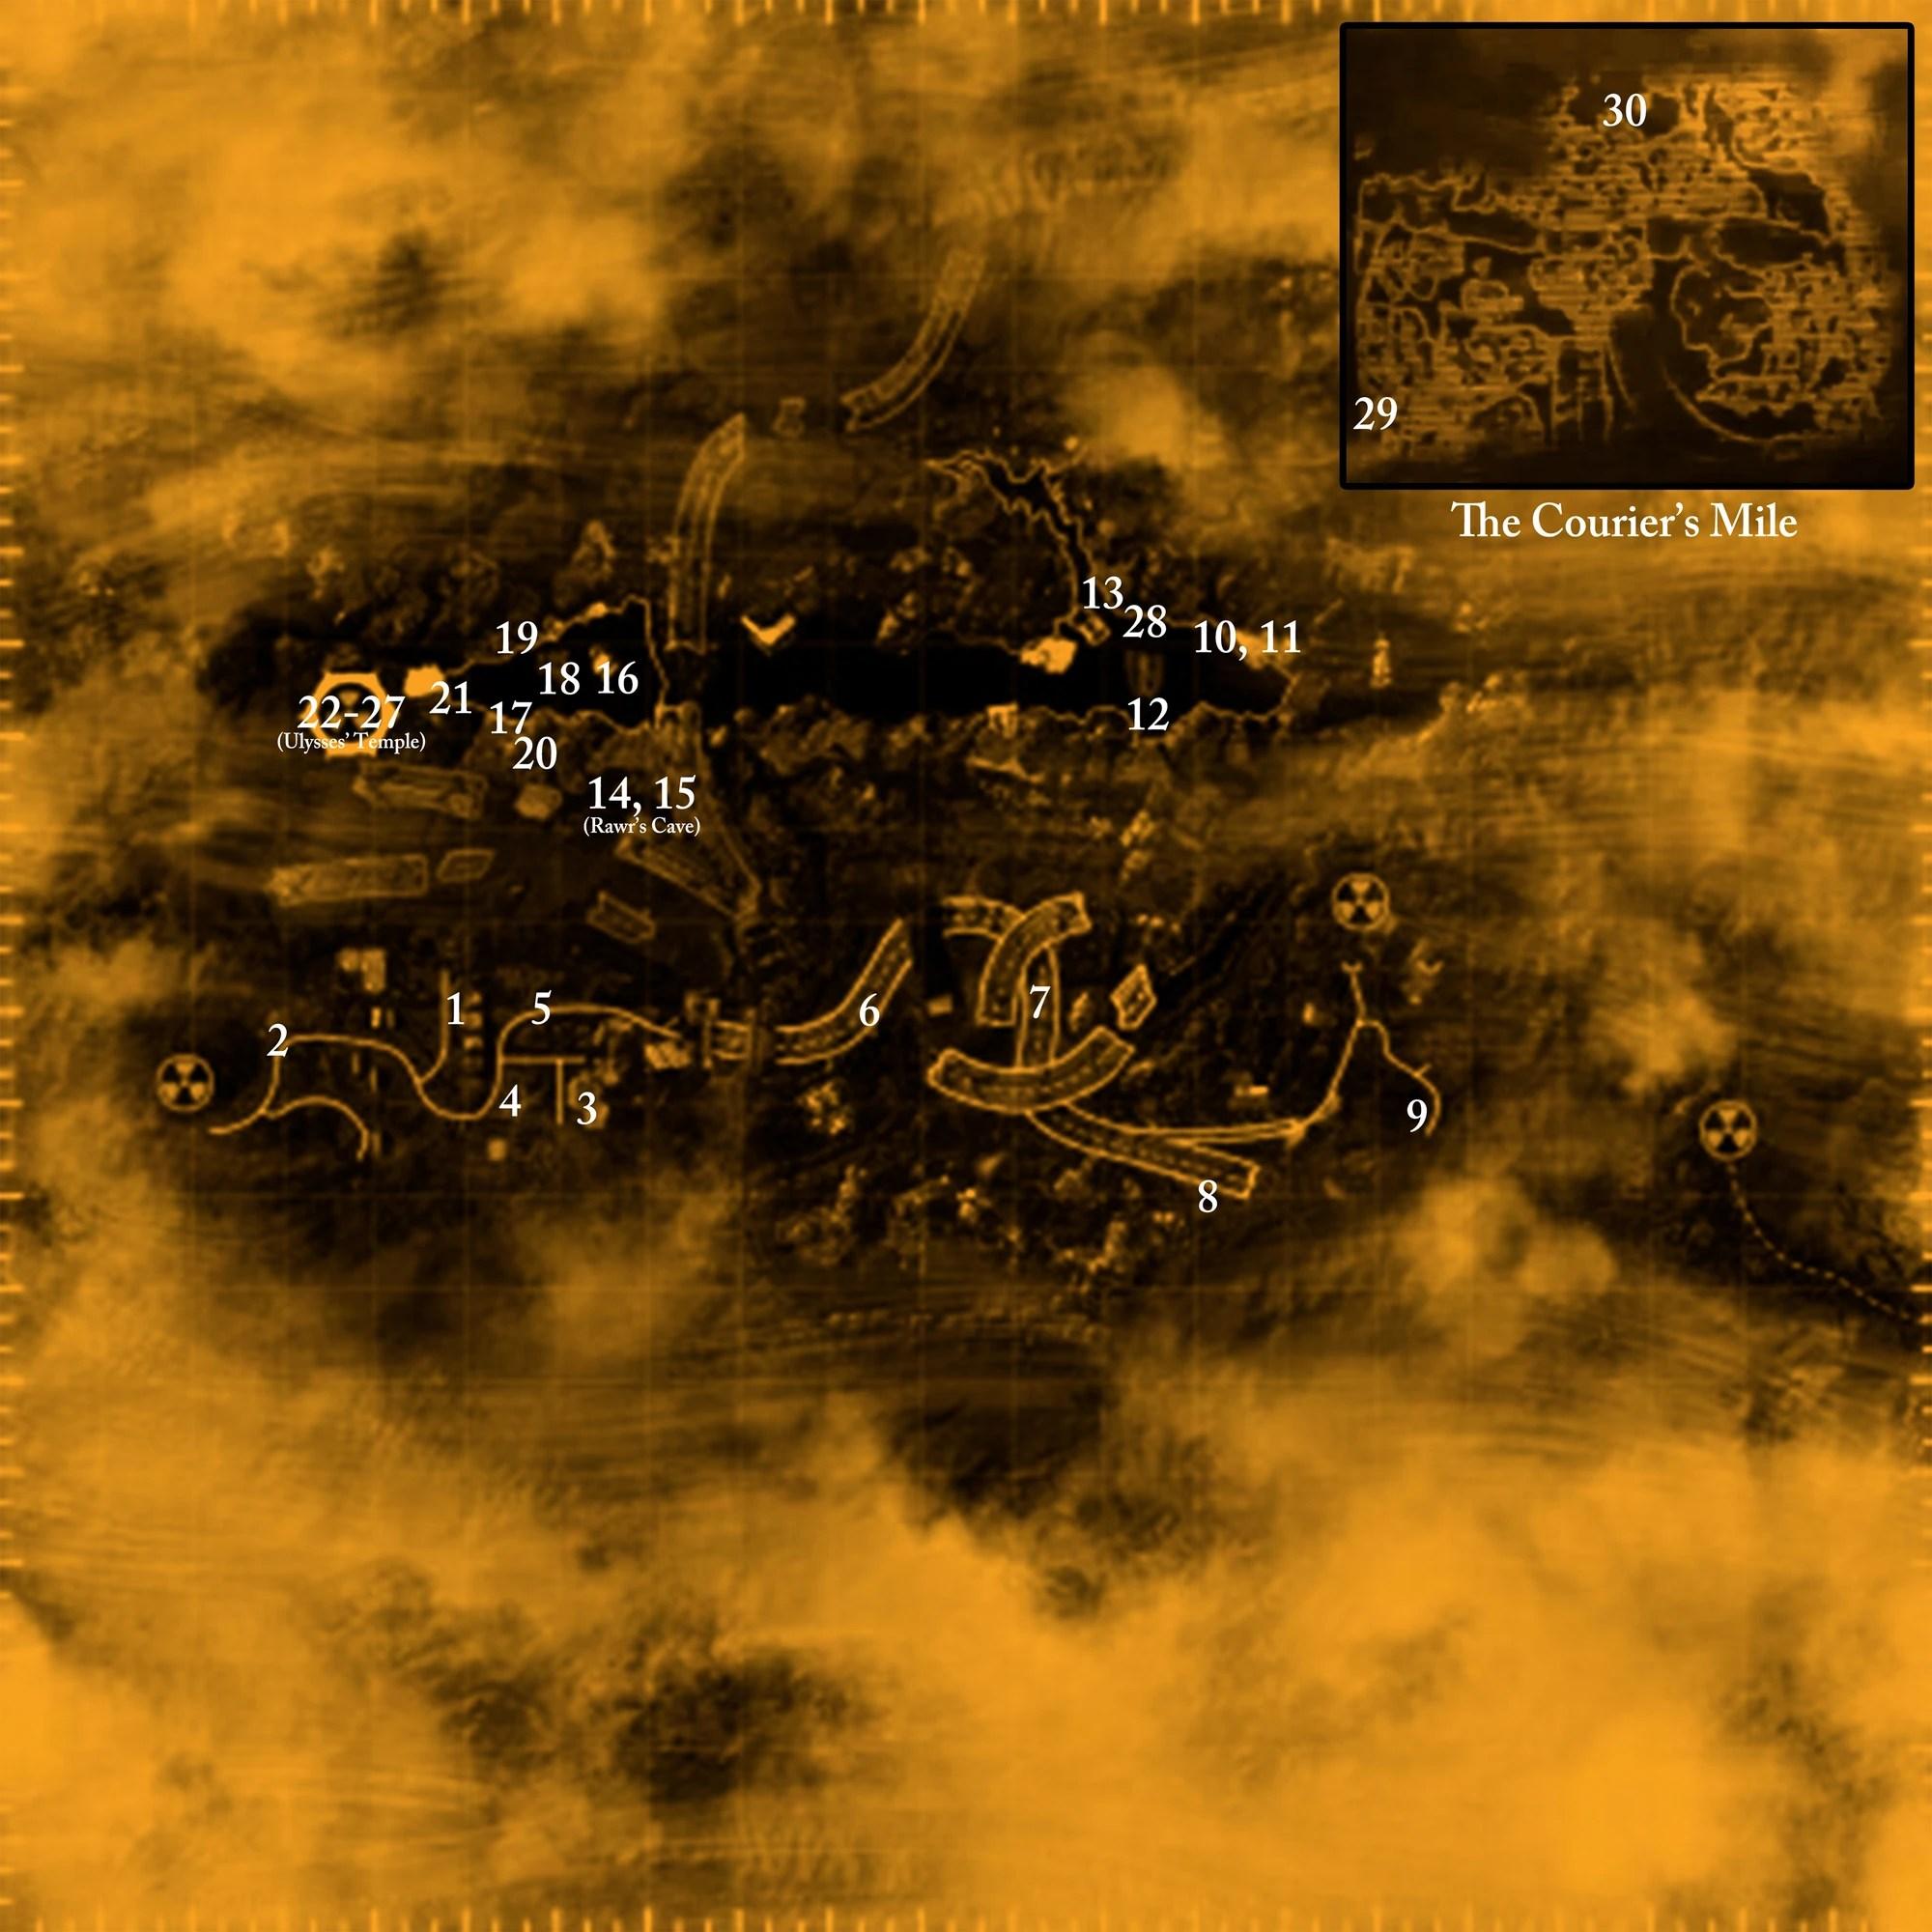 Warhead Lonesome Road Fallout Wiki FANDOM Powered By Wikia